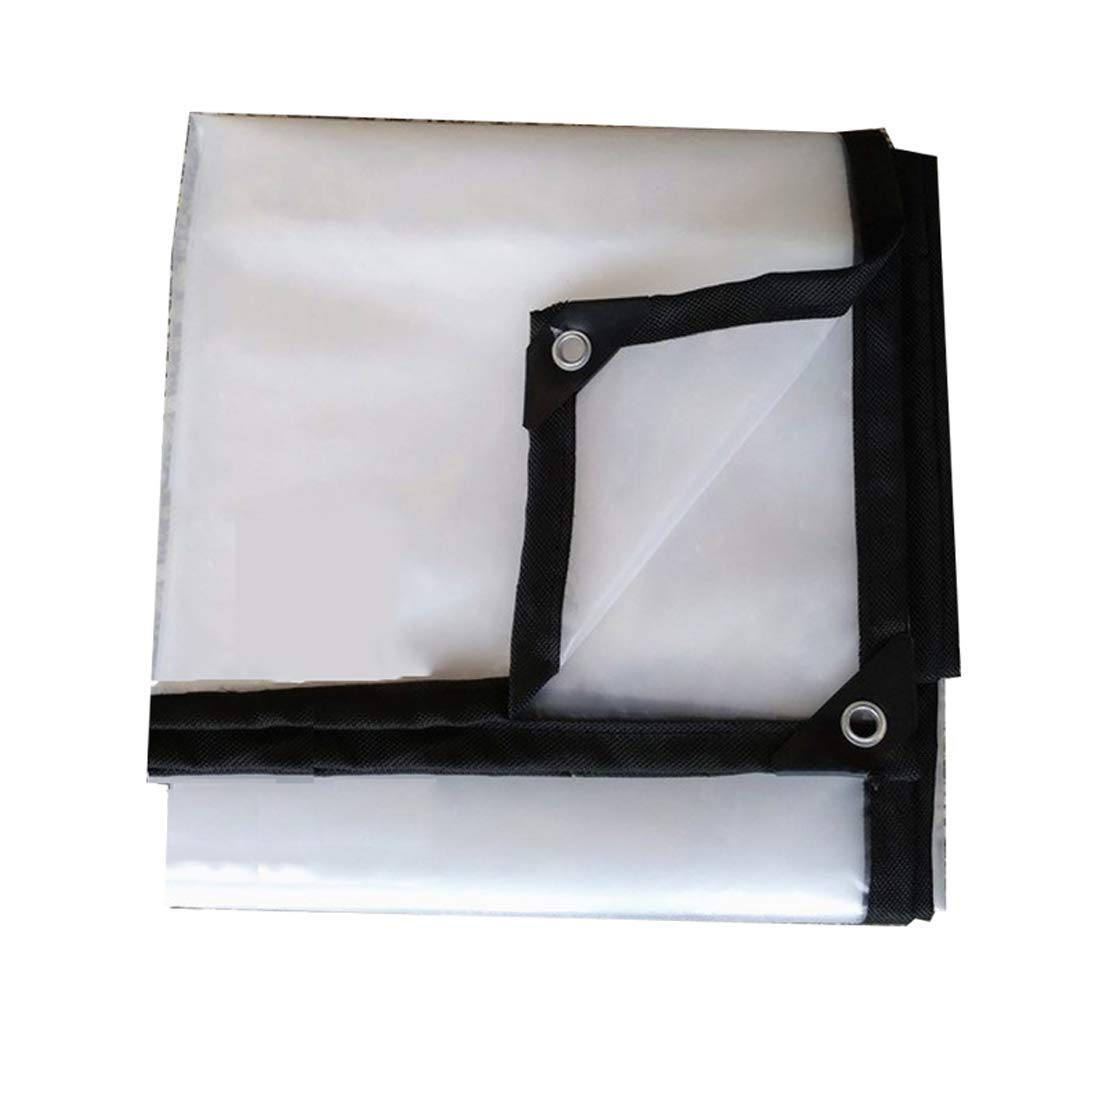 GLP Panno di tela cerata impermeabile in plastica trasparente Panno di tela cerata impermeabile in plastica (120 g mq, 0,2 mm) (Dimensione   4mx8m)